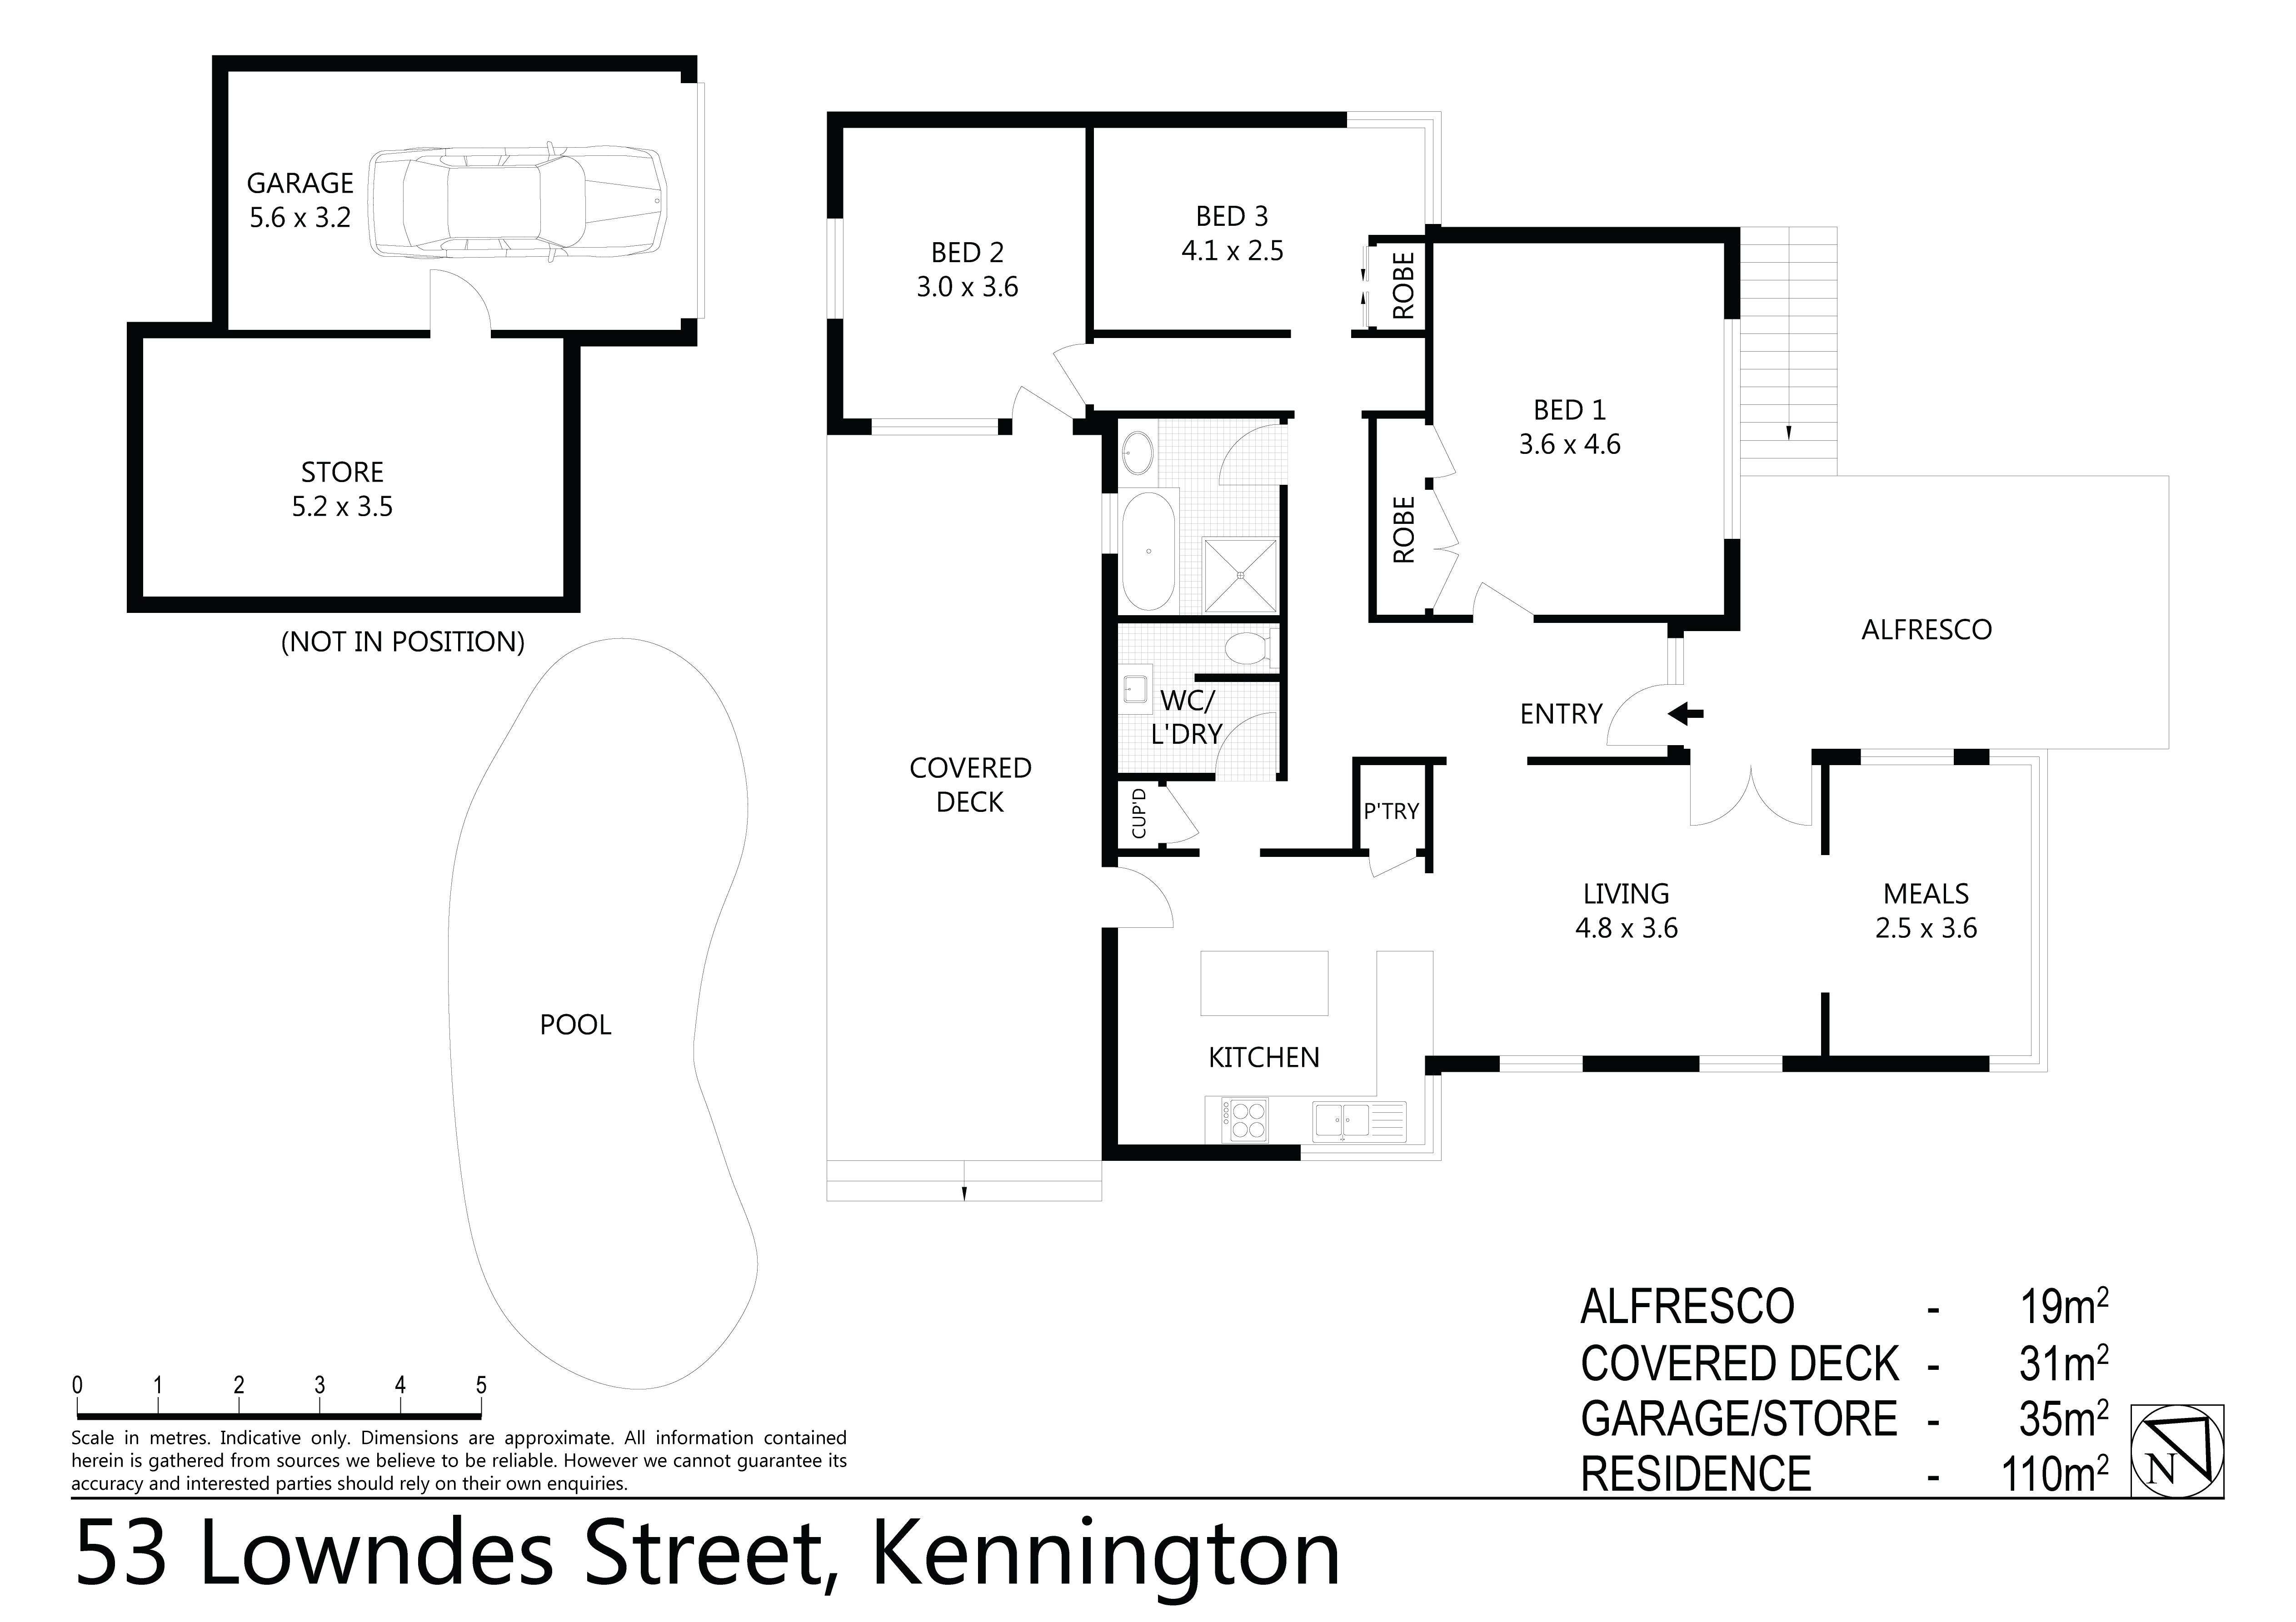 53 Lowndes Street, Kennington, VIC 3550